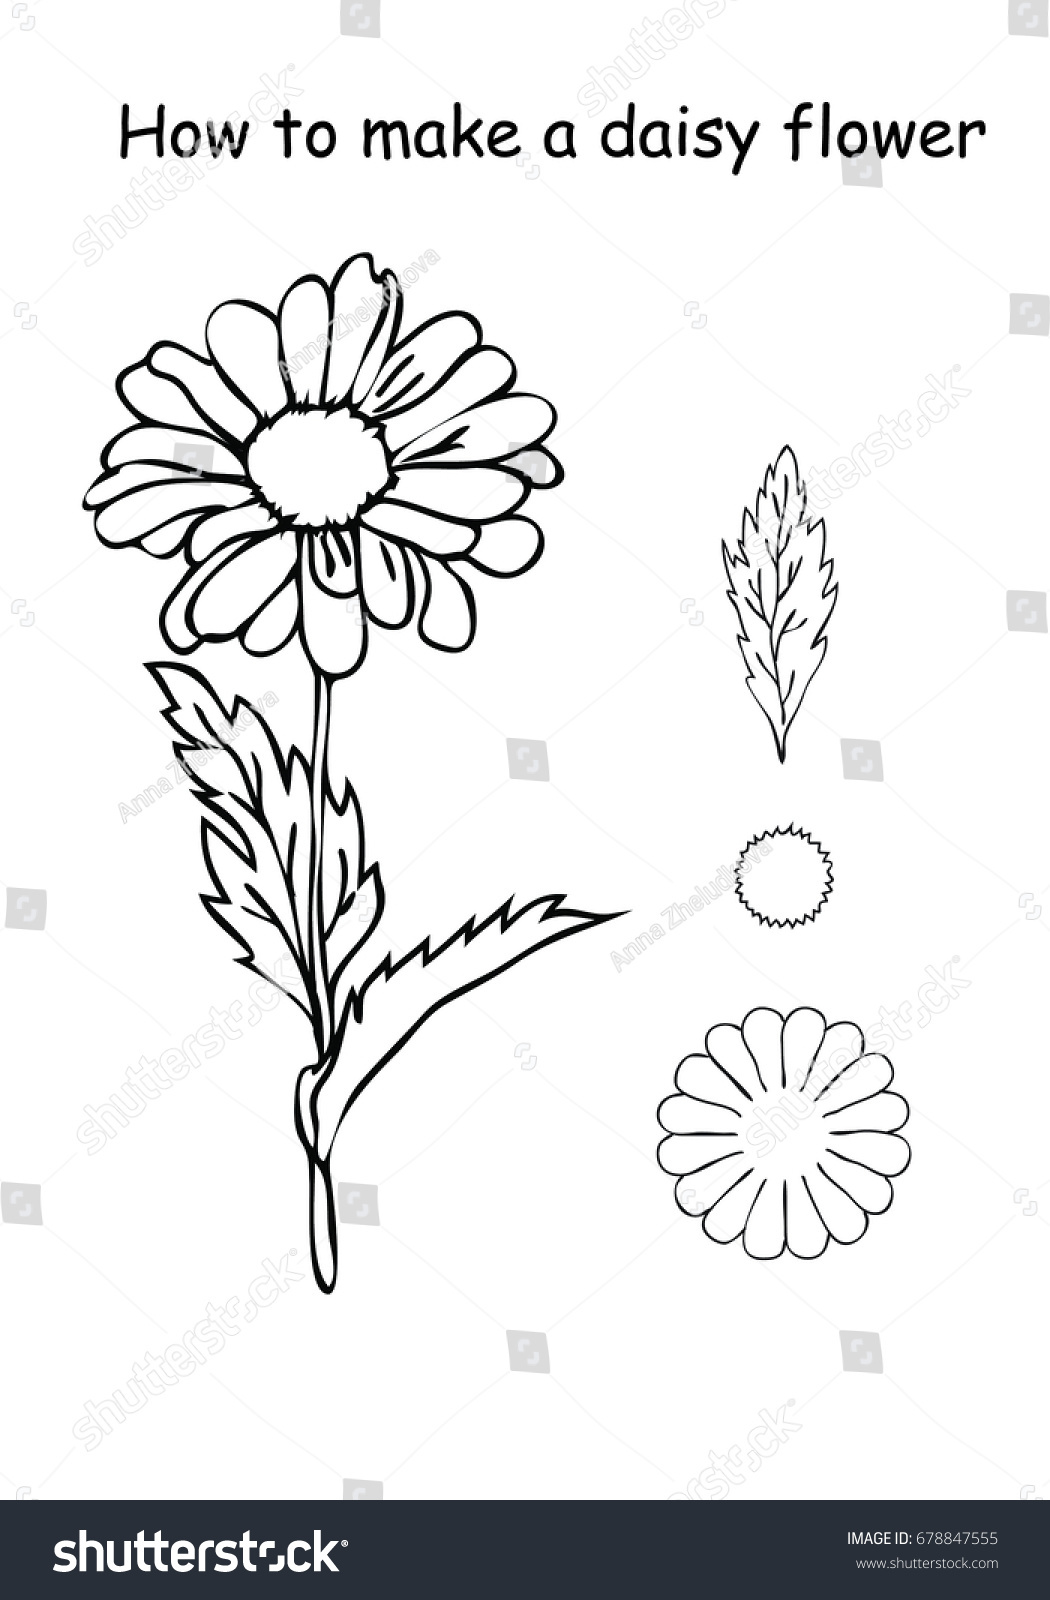 How Make Daisy Flower Outline Scheme Stock Vector Royalty Free